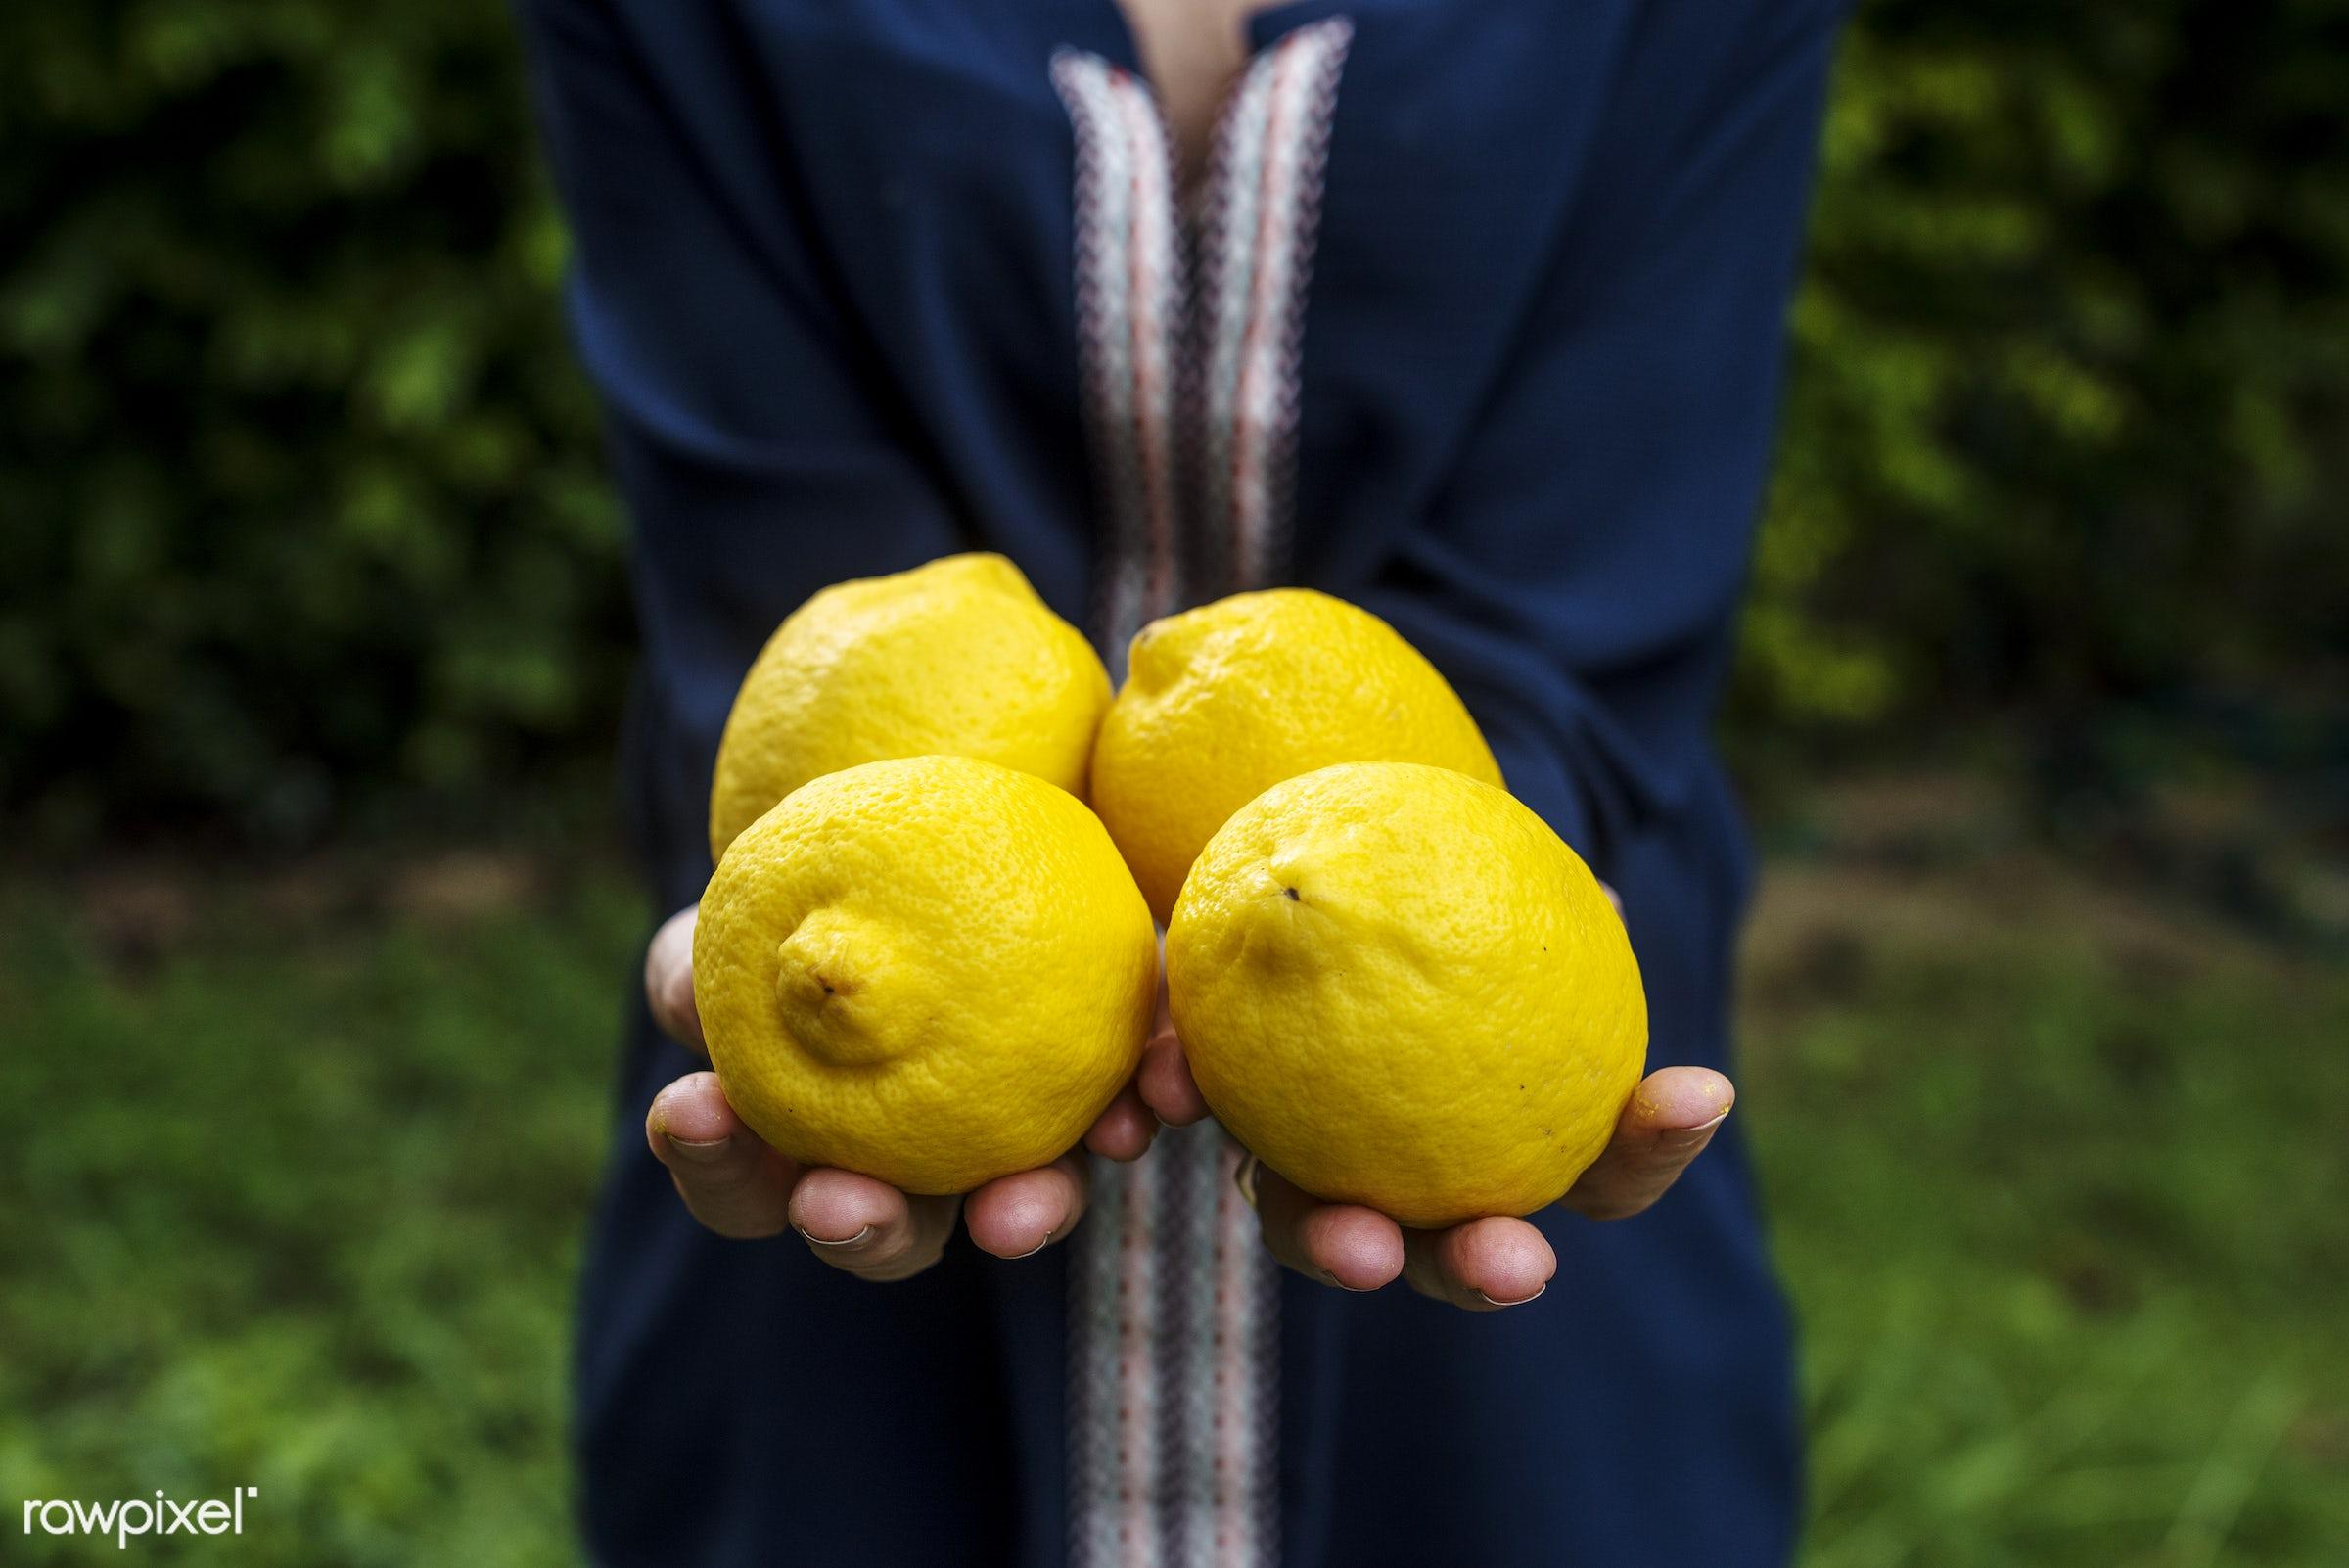 raw, holding, farm, nature, hands, fresh, closeup, fruit, organic, healthy, harvest, lemon, produce